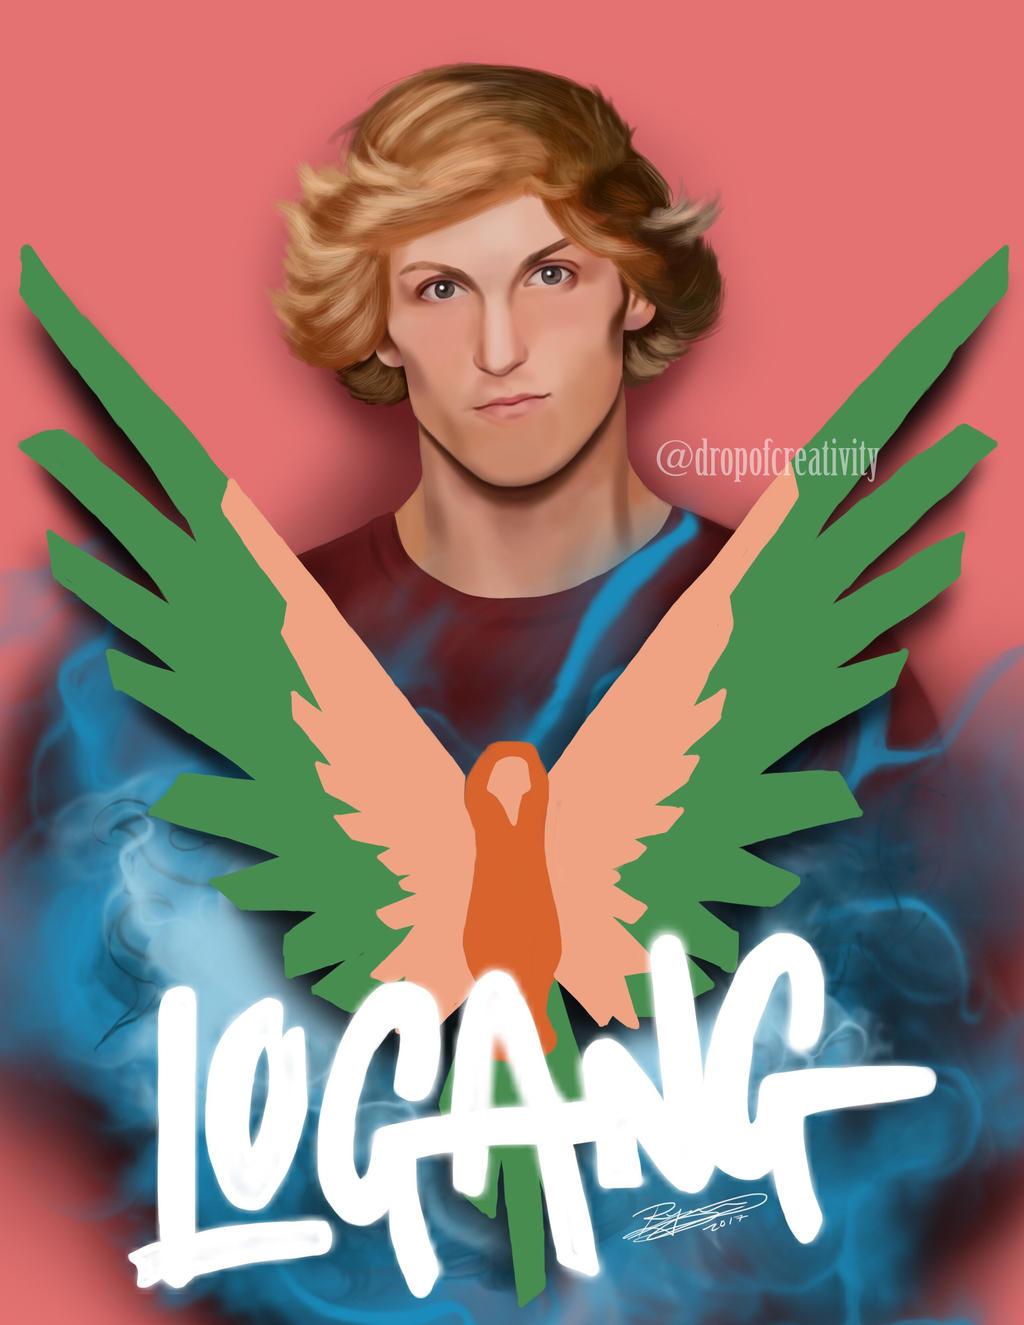 Logan Paul By Dropofcreativity On DeviantArt